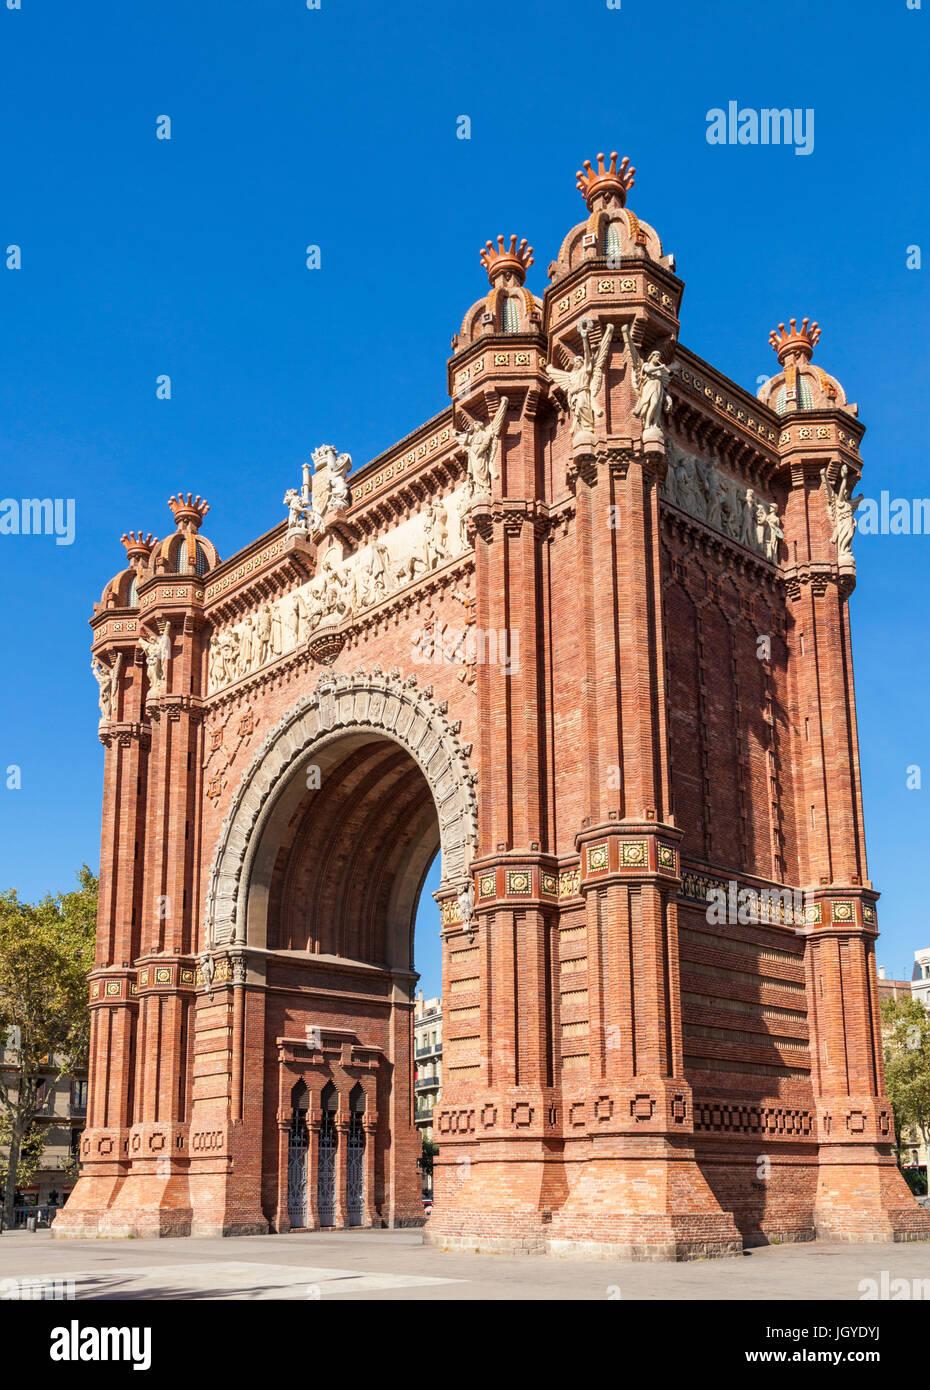 Barcelona Catalunya The Arc de Triomf de Barcelona Arco de Triunfo de Barcelona triumphal arch Barcelona arc de Stock Photo